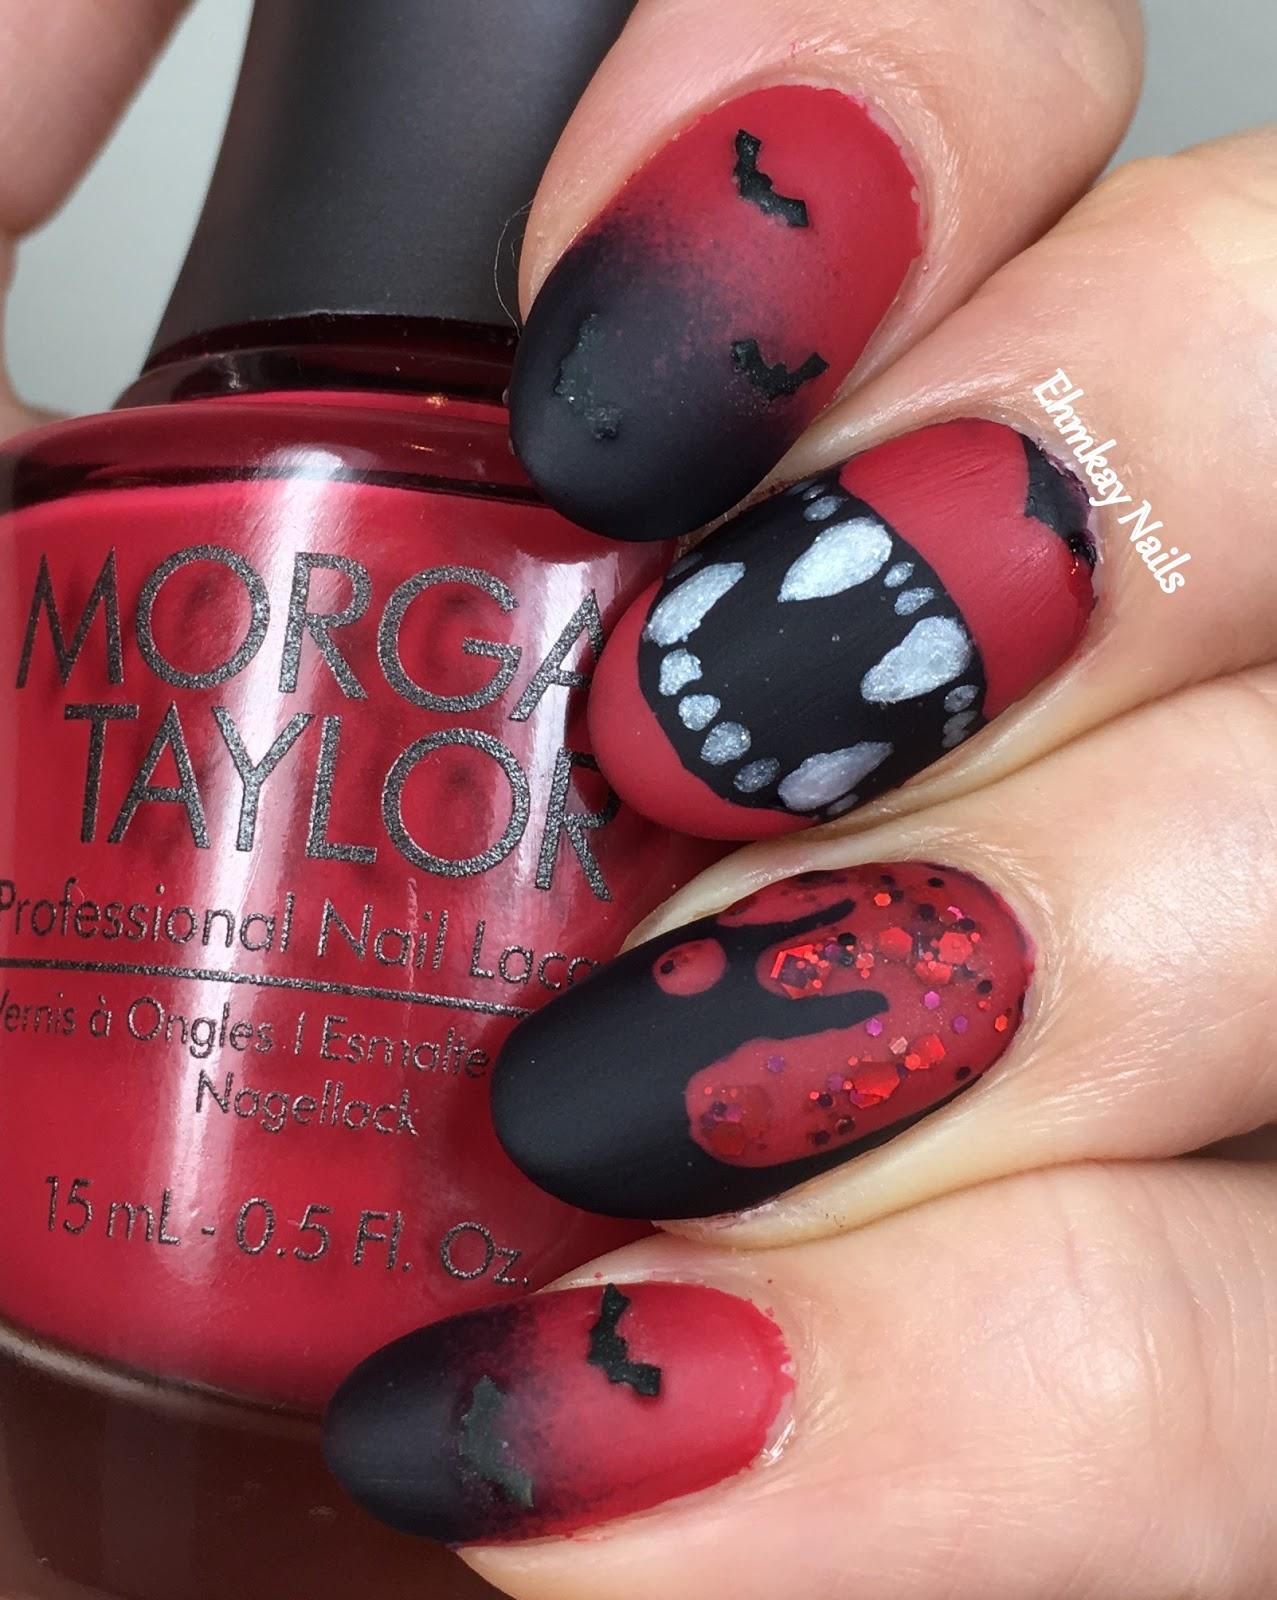 13 Days of Halloween Nail Art: Vampire Nail Art with Morgan Taylor Matadora  Collection - Ehmkay Nails: 13 Days Of Halloween Nail Art: Vampire Nail Art With